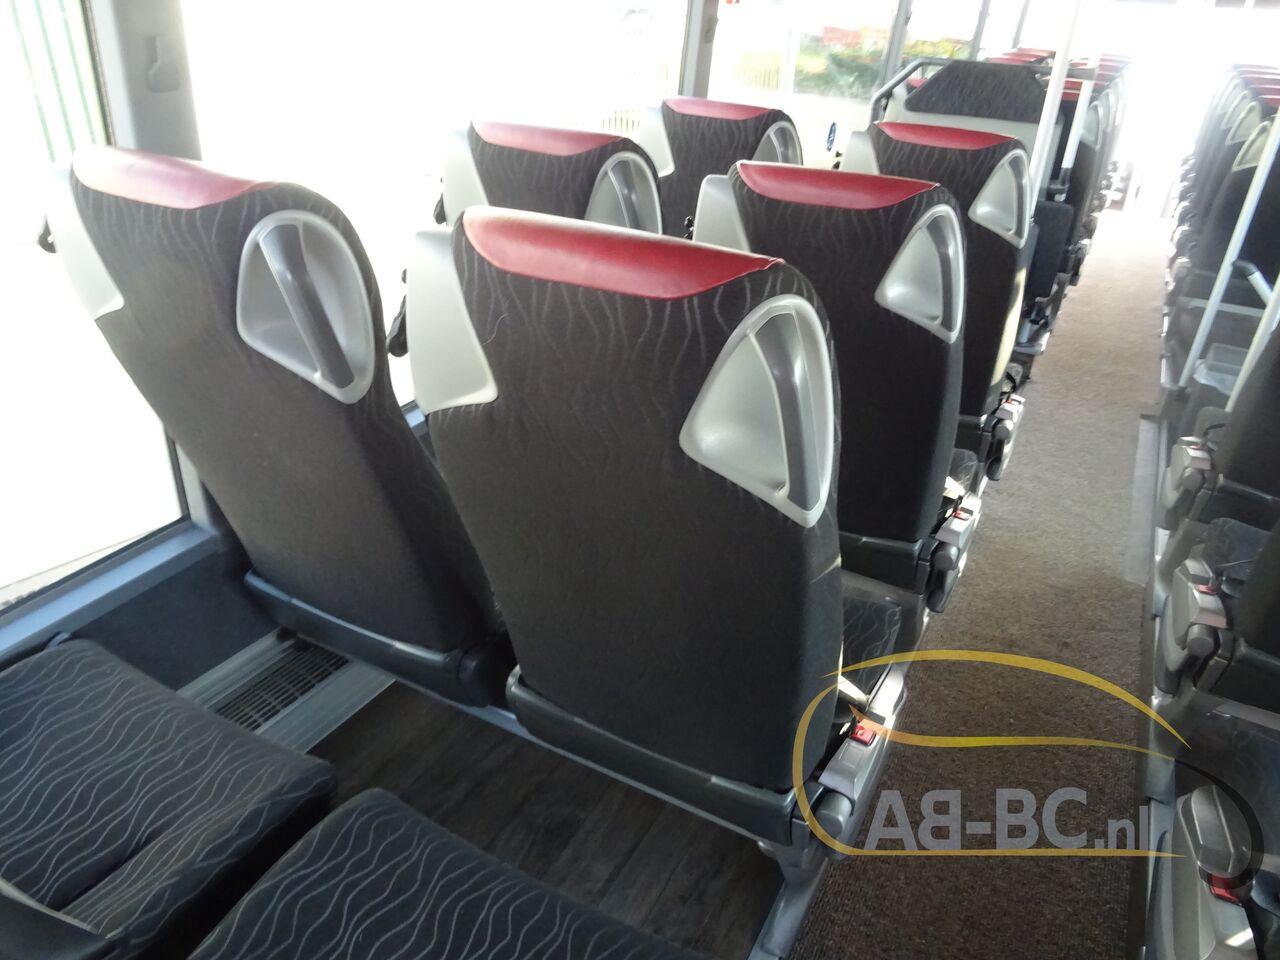 coach-bus-SETRA-S415H-52-Seats-EURO-6-Liftbus---1630913502556858332_big_9b2d64c2b66c246c4e98387a7707c95e--21070517141280735500